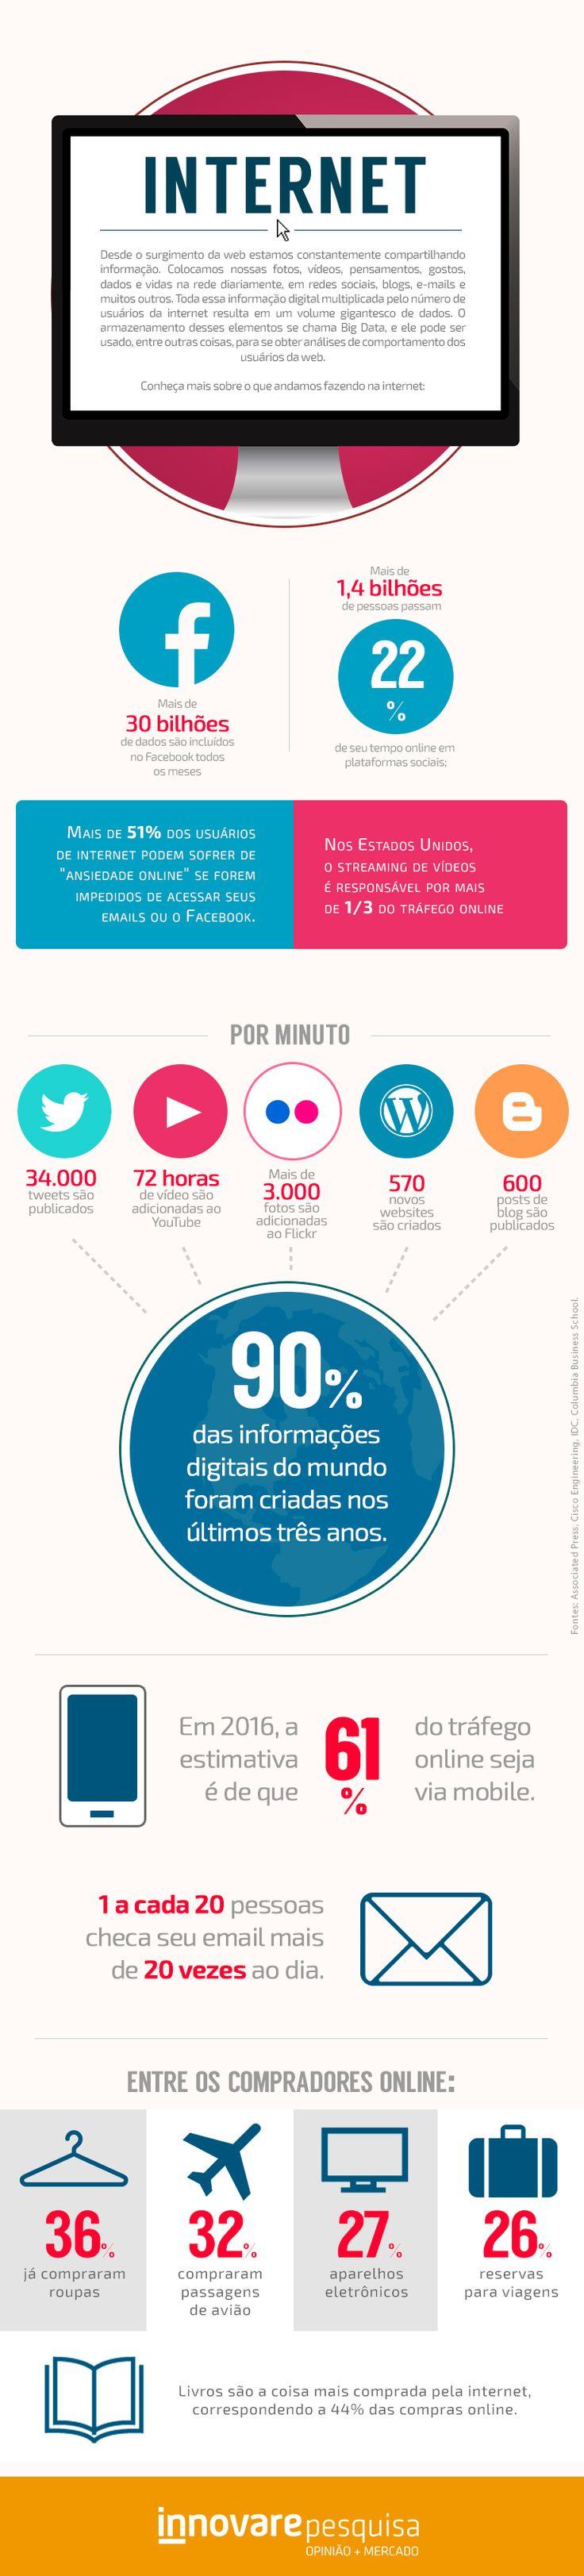 #internet #web #digital #bigdata #analytics #streaming #facebook #twitter #youtube #flickr #wordpress #blog #mobile #email #compras #ecommerce #innovarepesquisa #pesquisa #innovare